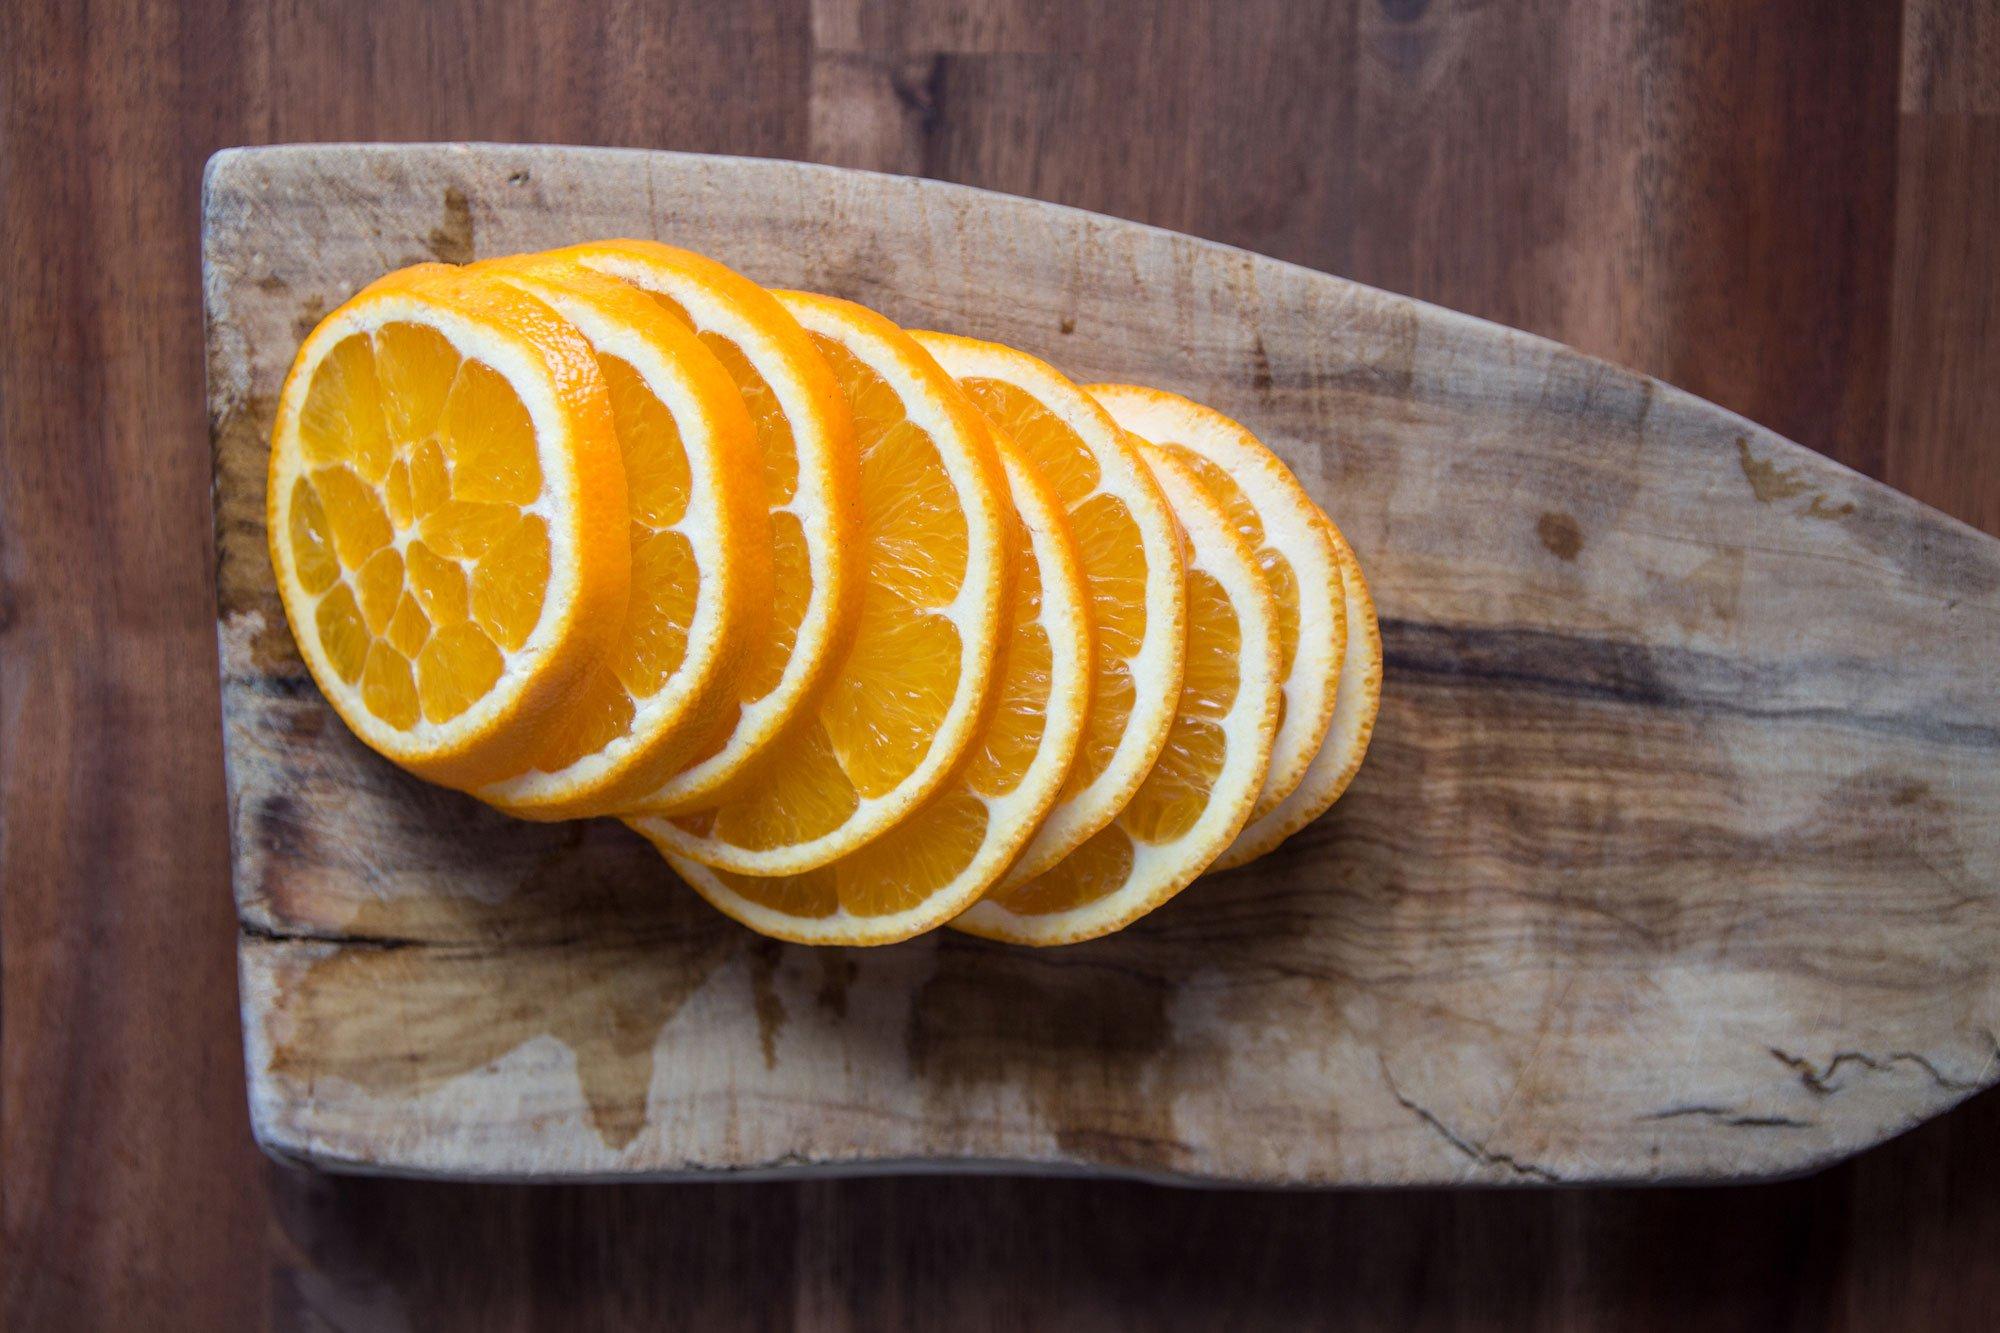 orange slices on wooden cutting board